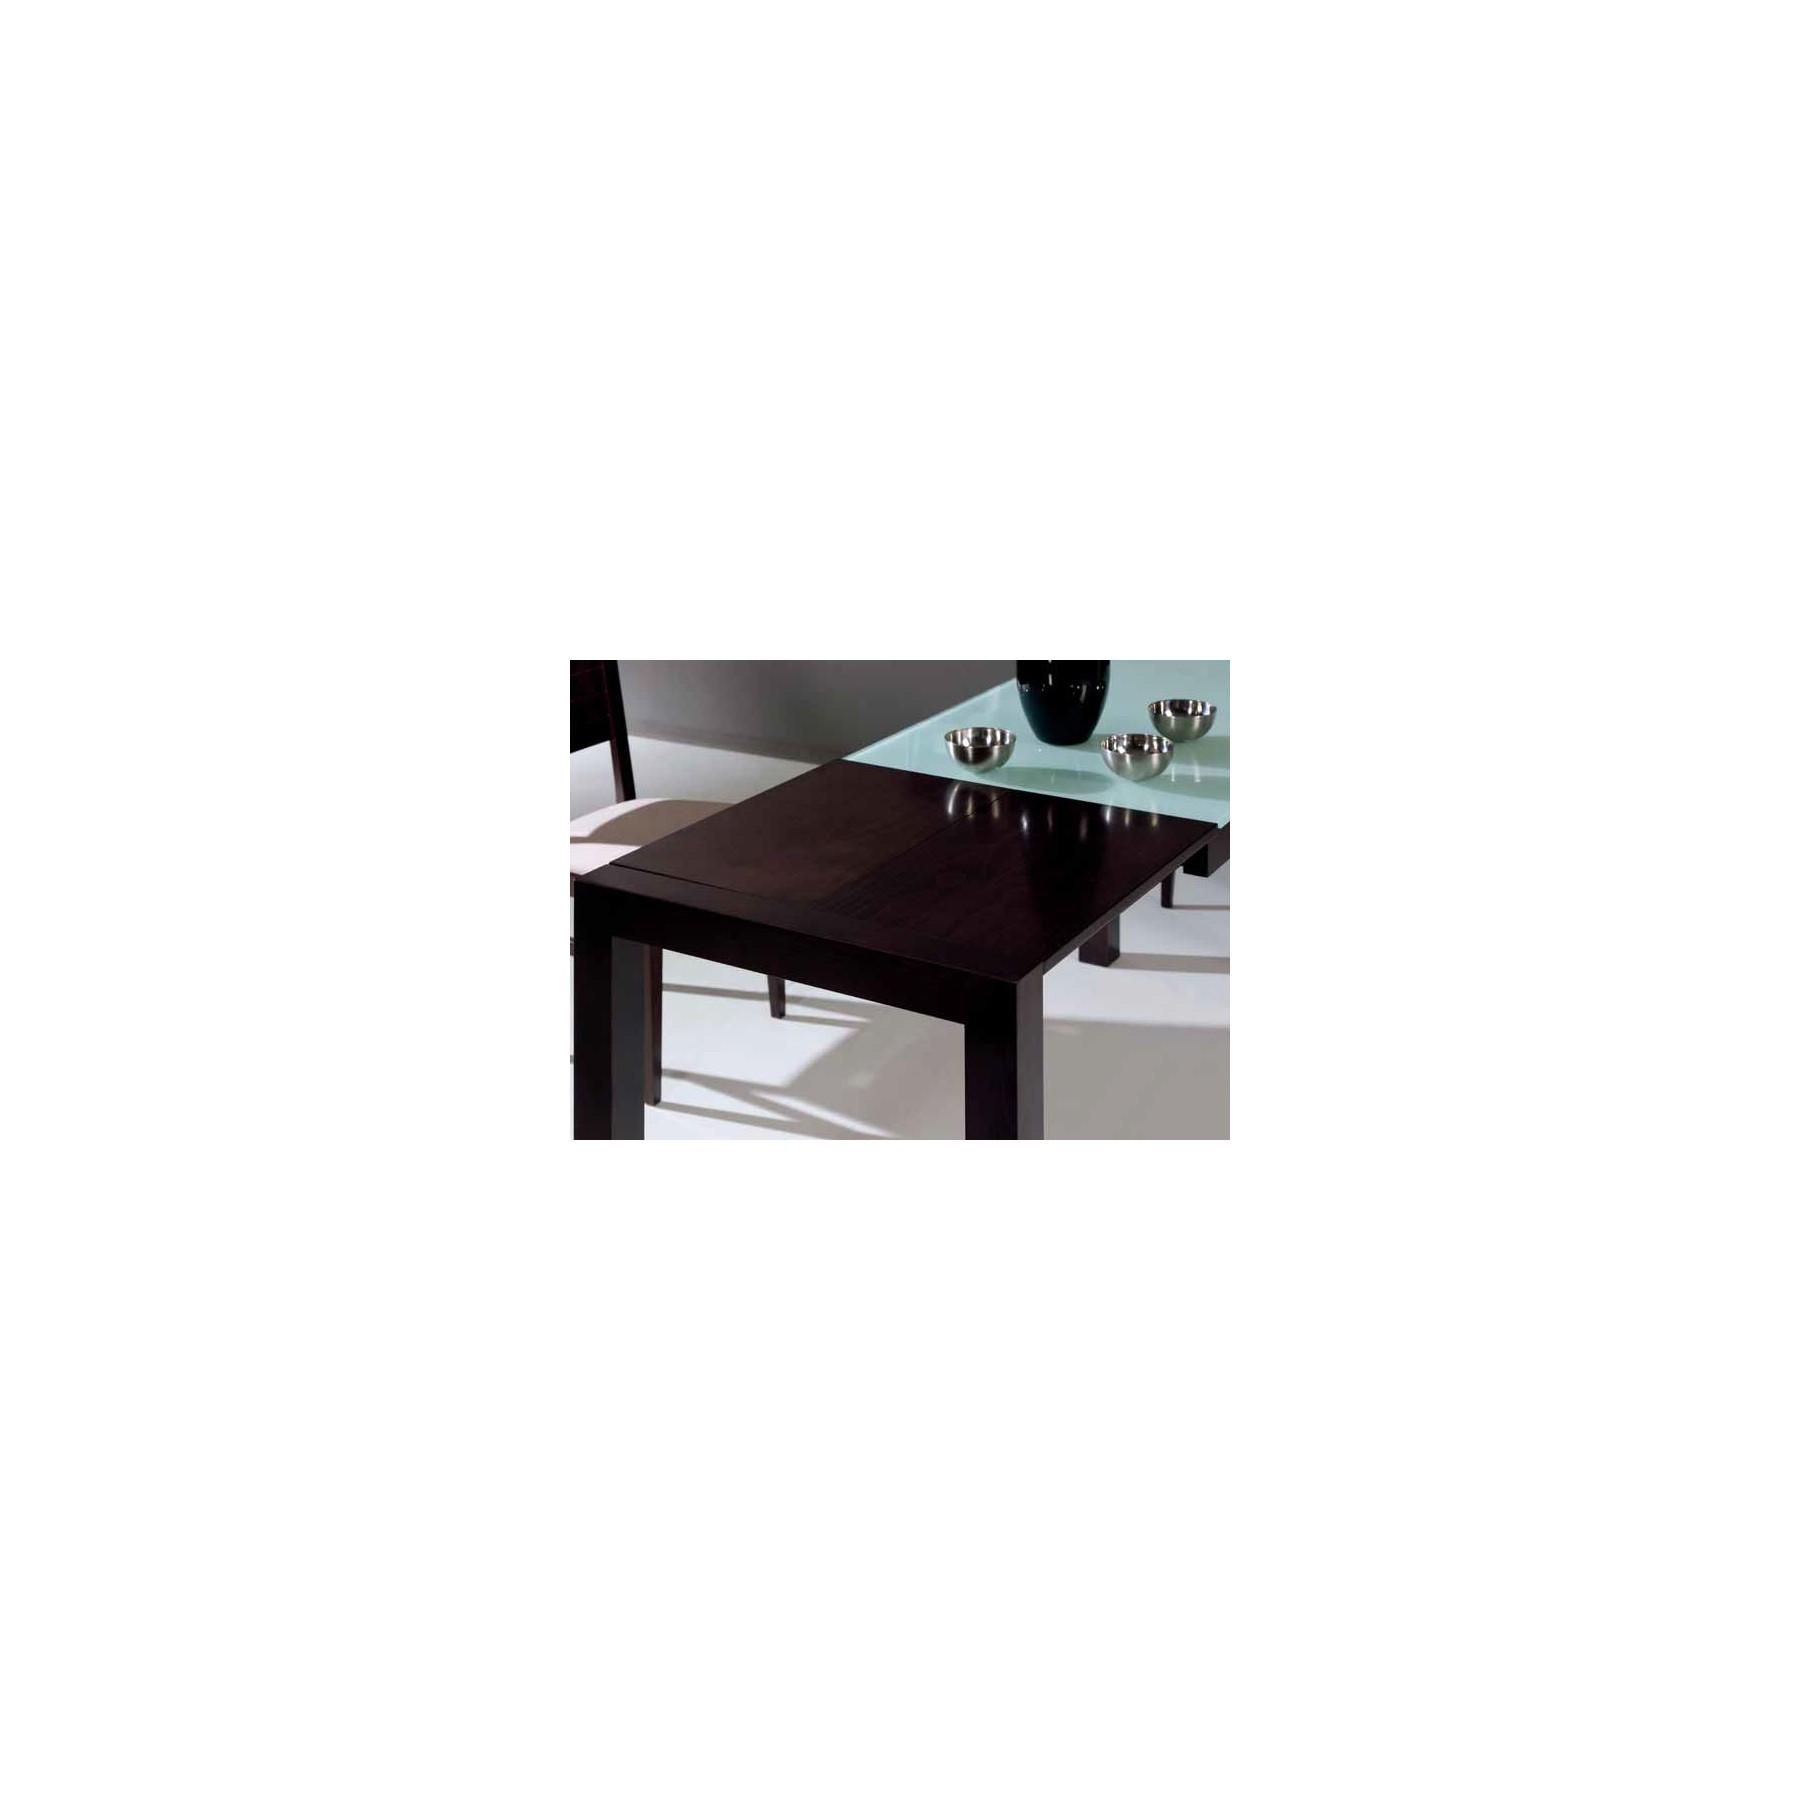 Mesas de cocina ikea precios el dise o de for Mesa cristal templado ikea